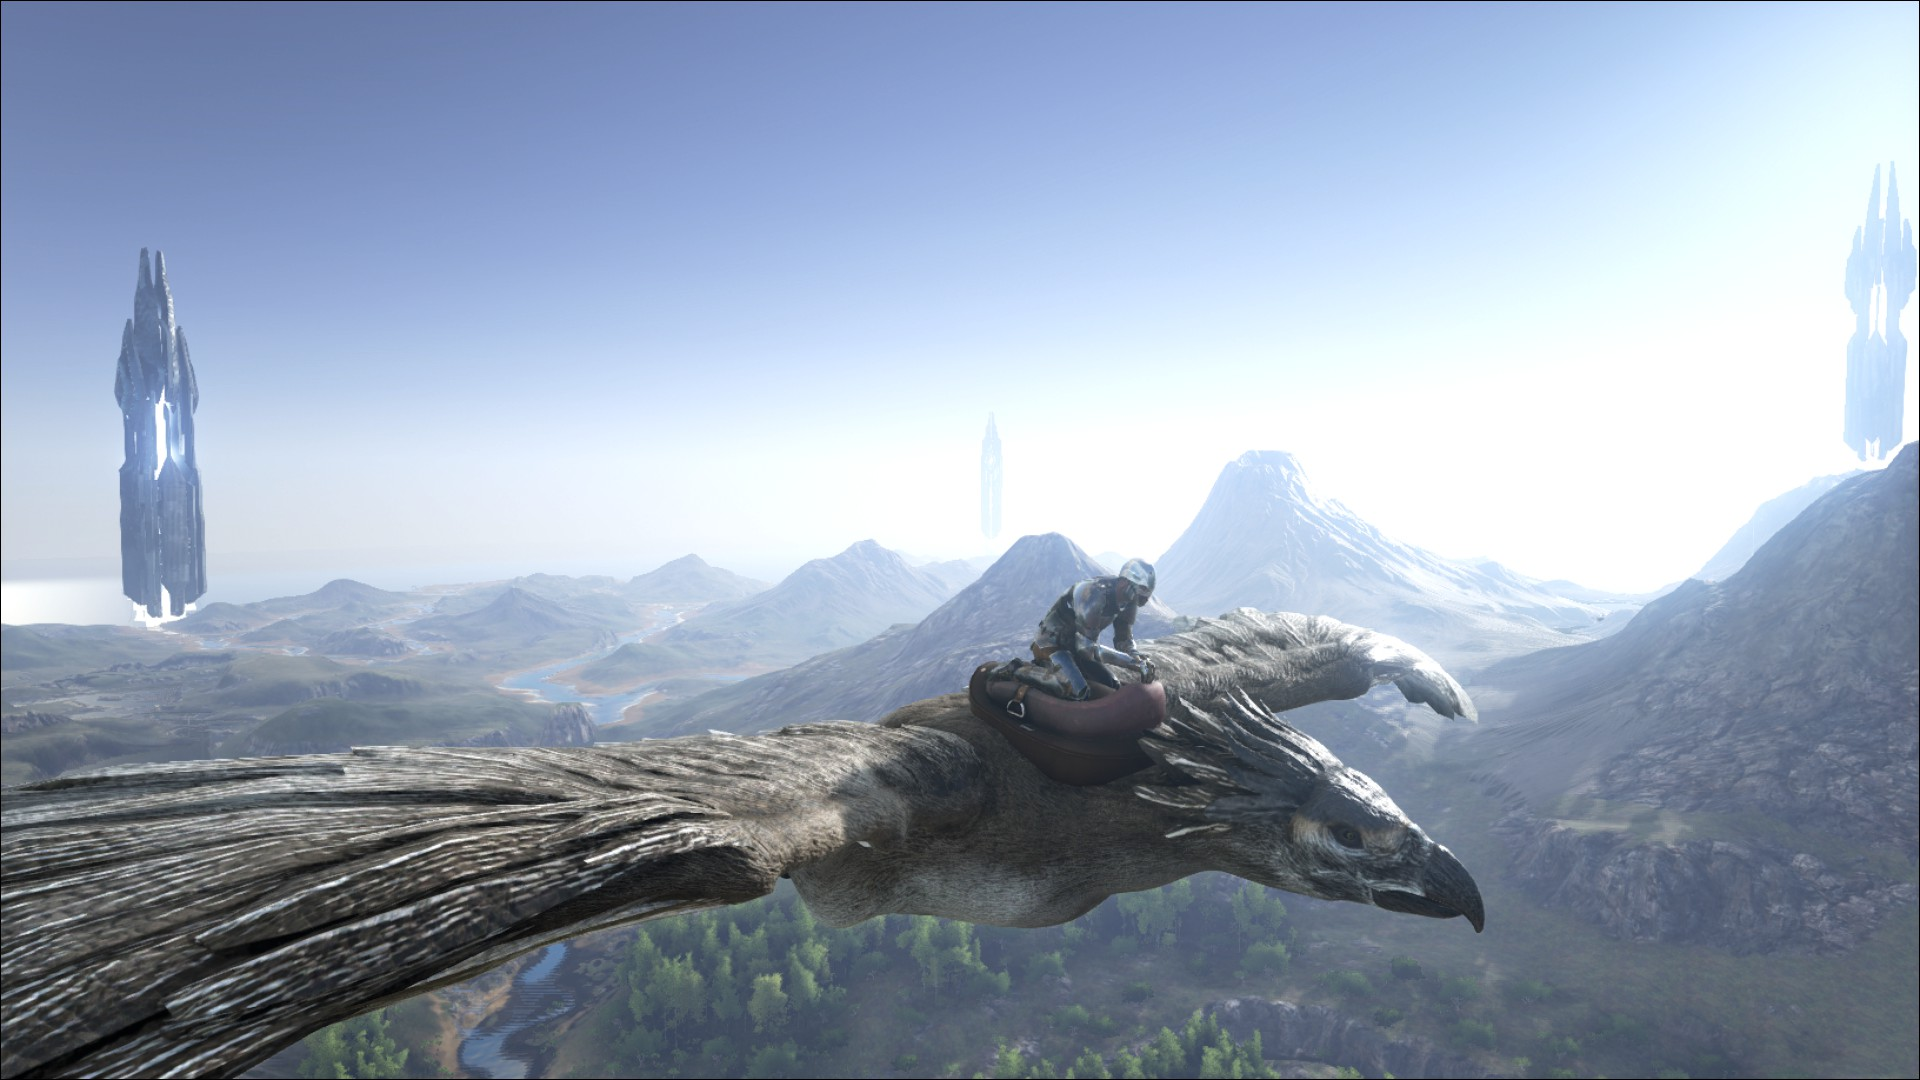 ARK Survival Evolved: Flugsaurier zähmen – Liste der Flugtiere & Taming Guide 2020